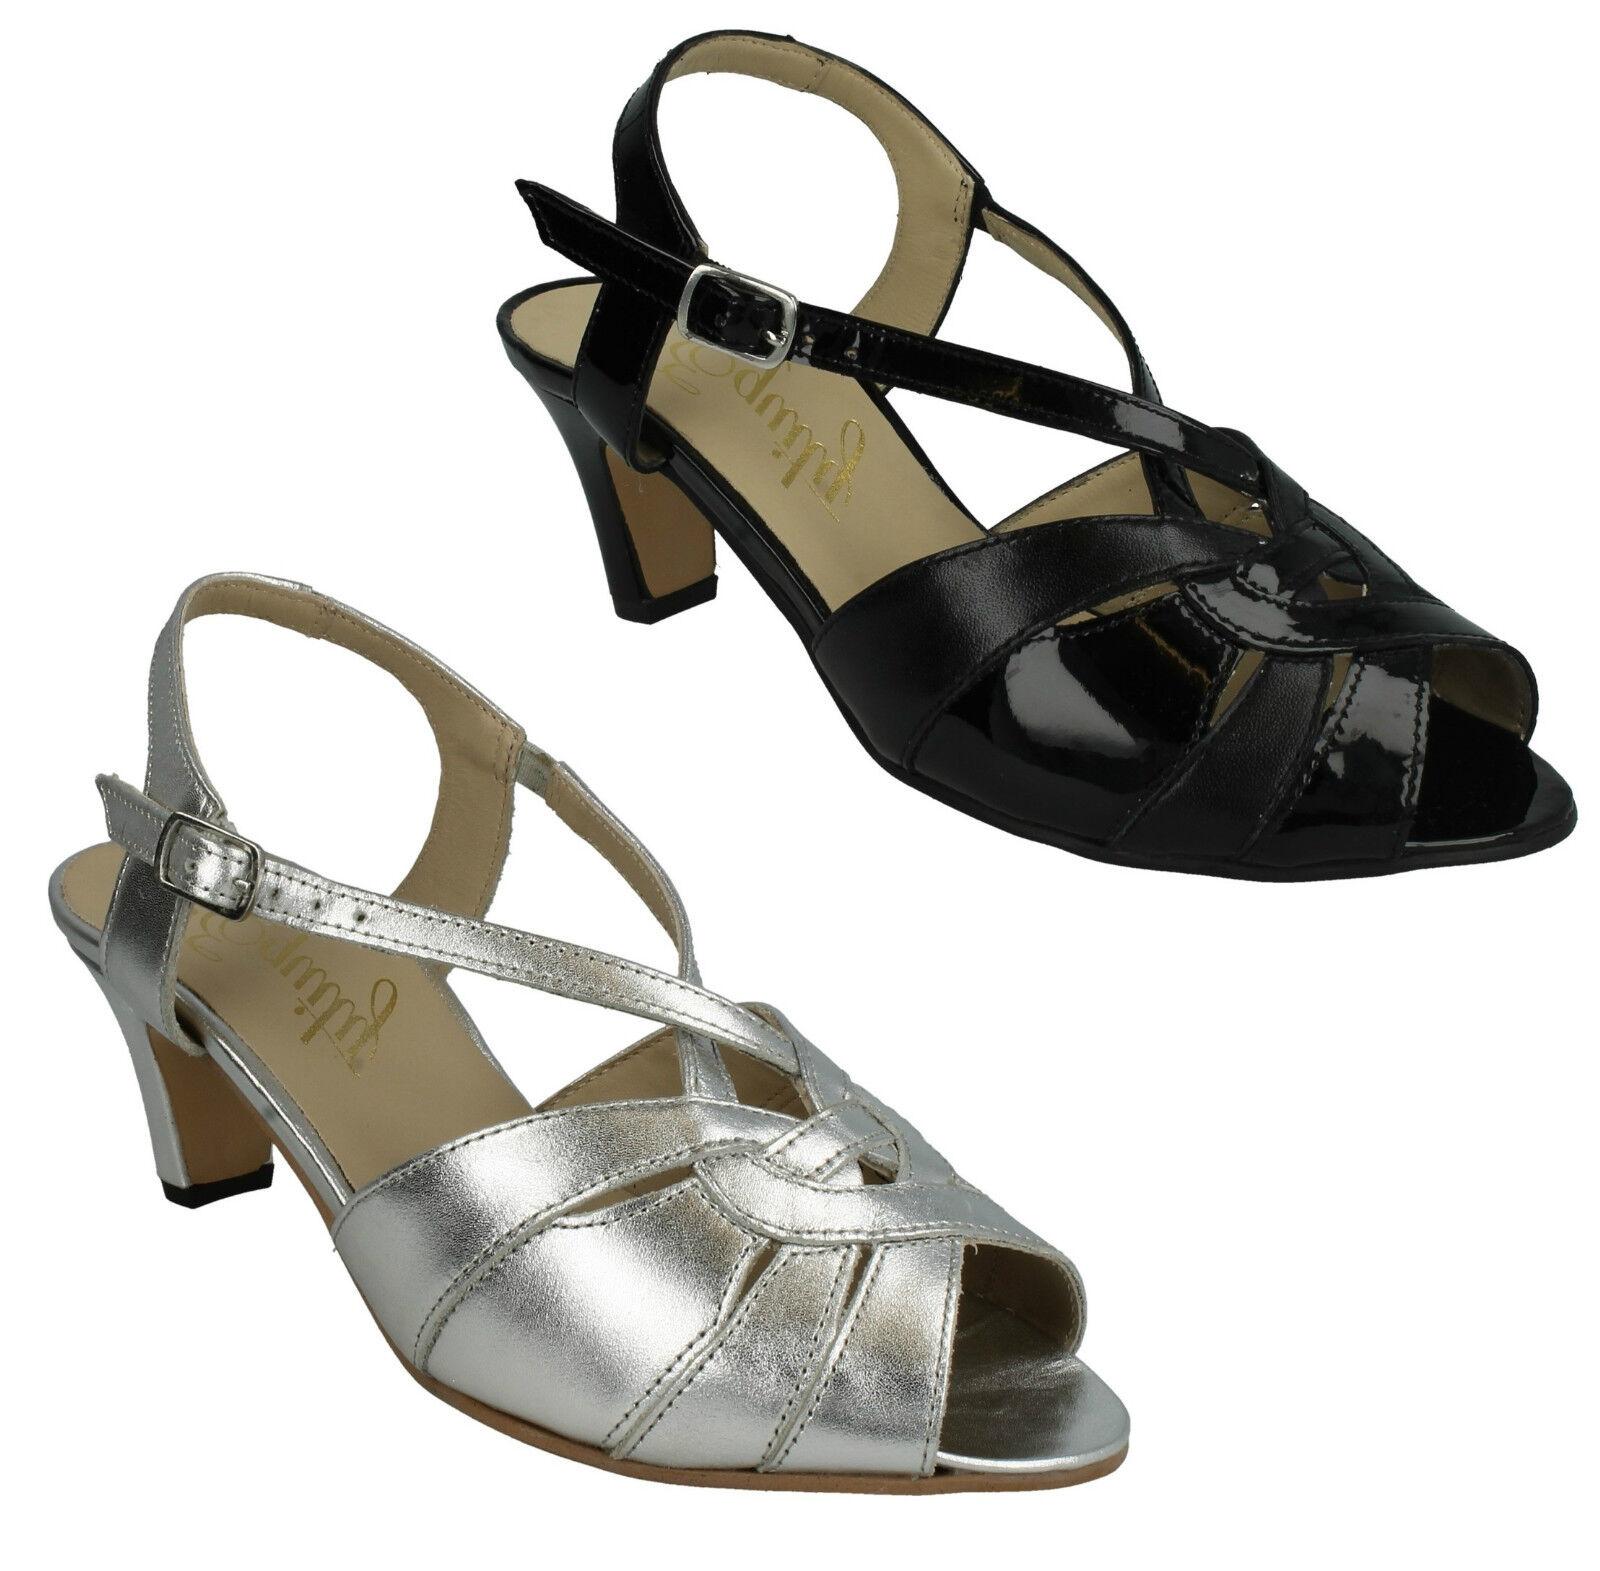 Sarah señoras equidad Peep Toe Hebilla ESLINGA ESLINGA ESLINGA vuelta amplia Kitten Danza Sandalias  producto de calidad